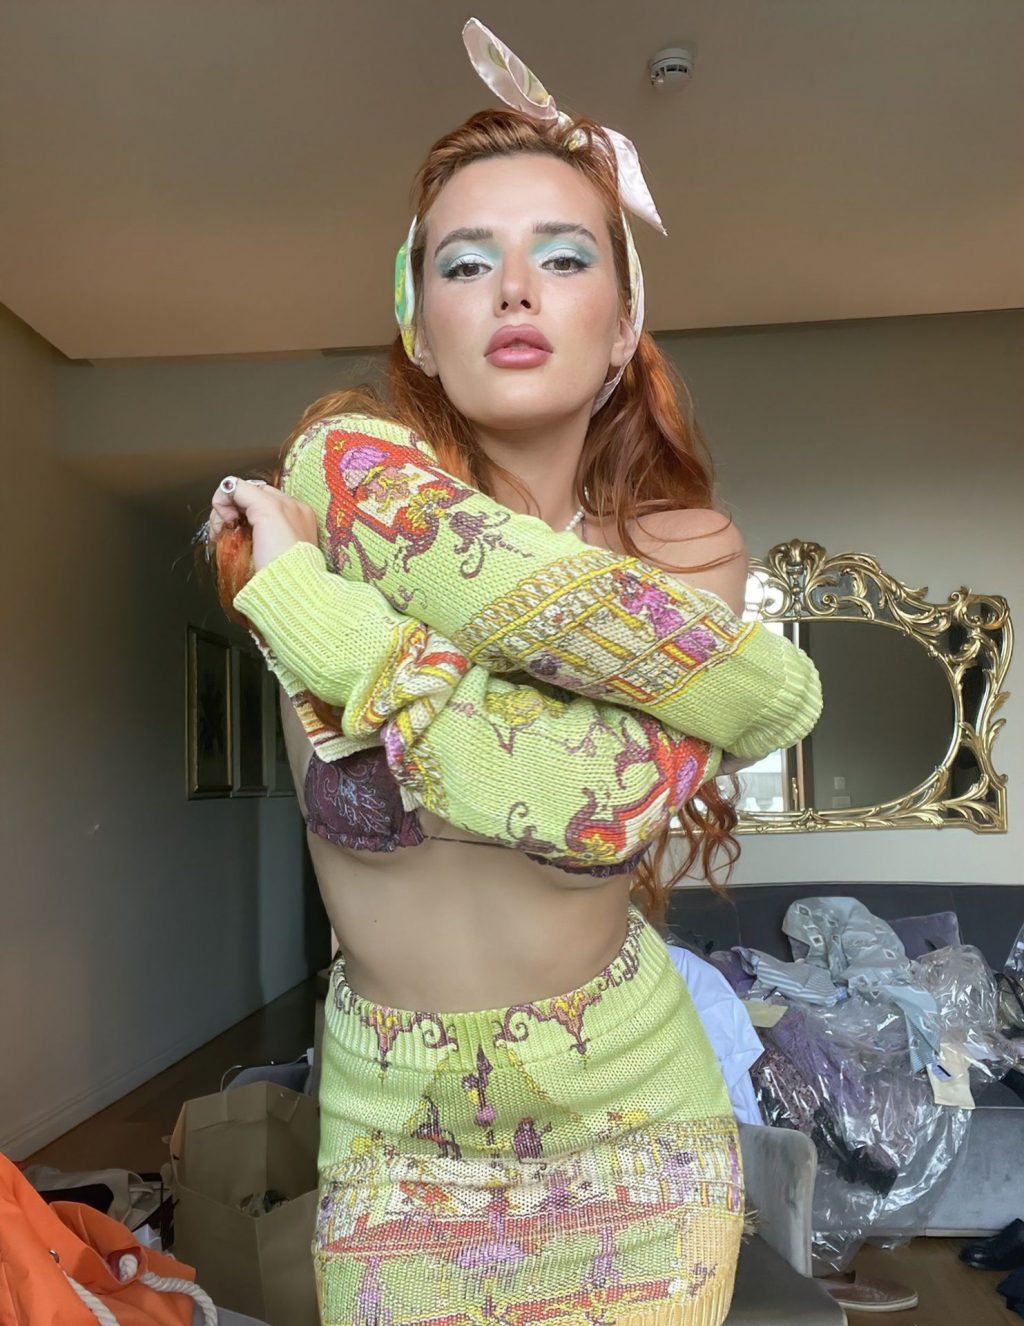 bella-thorne